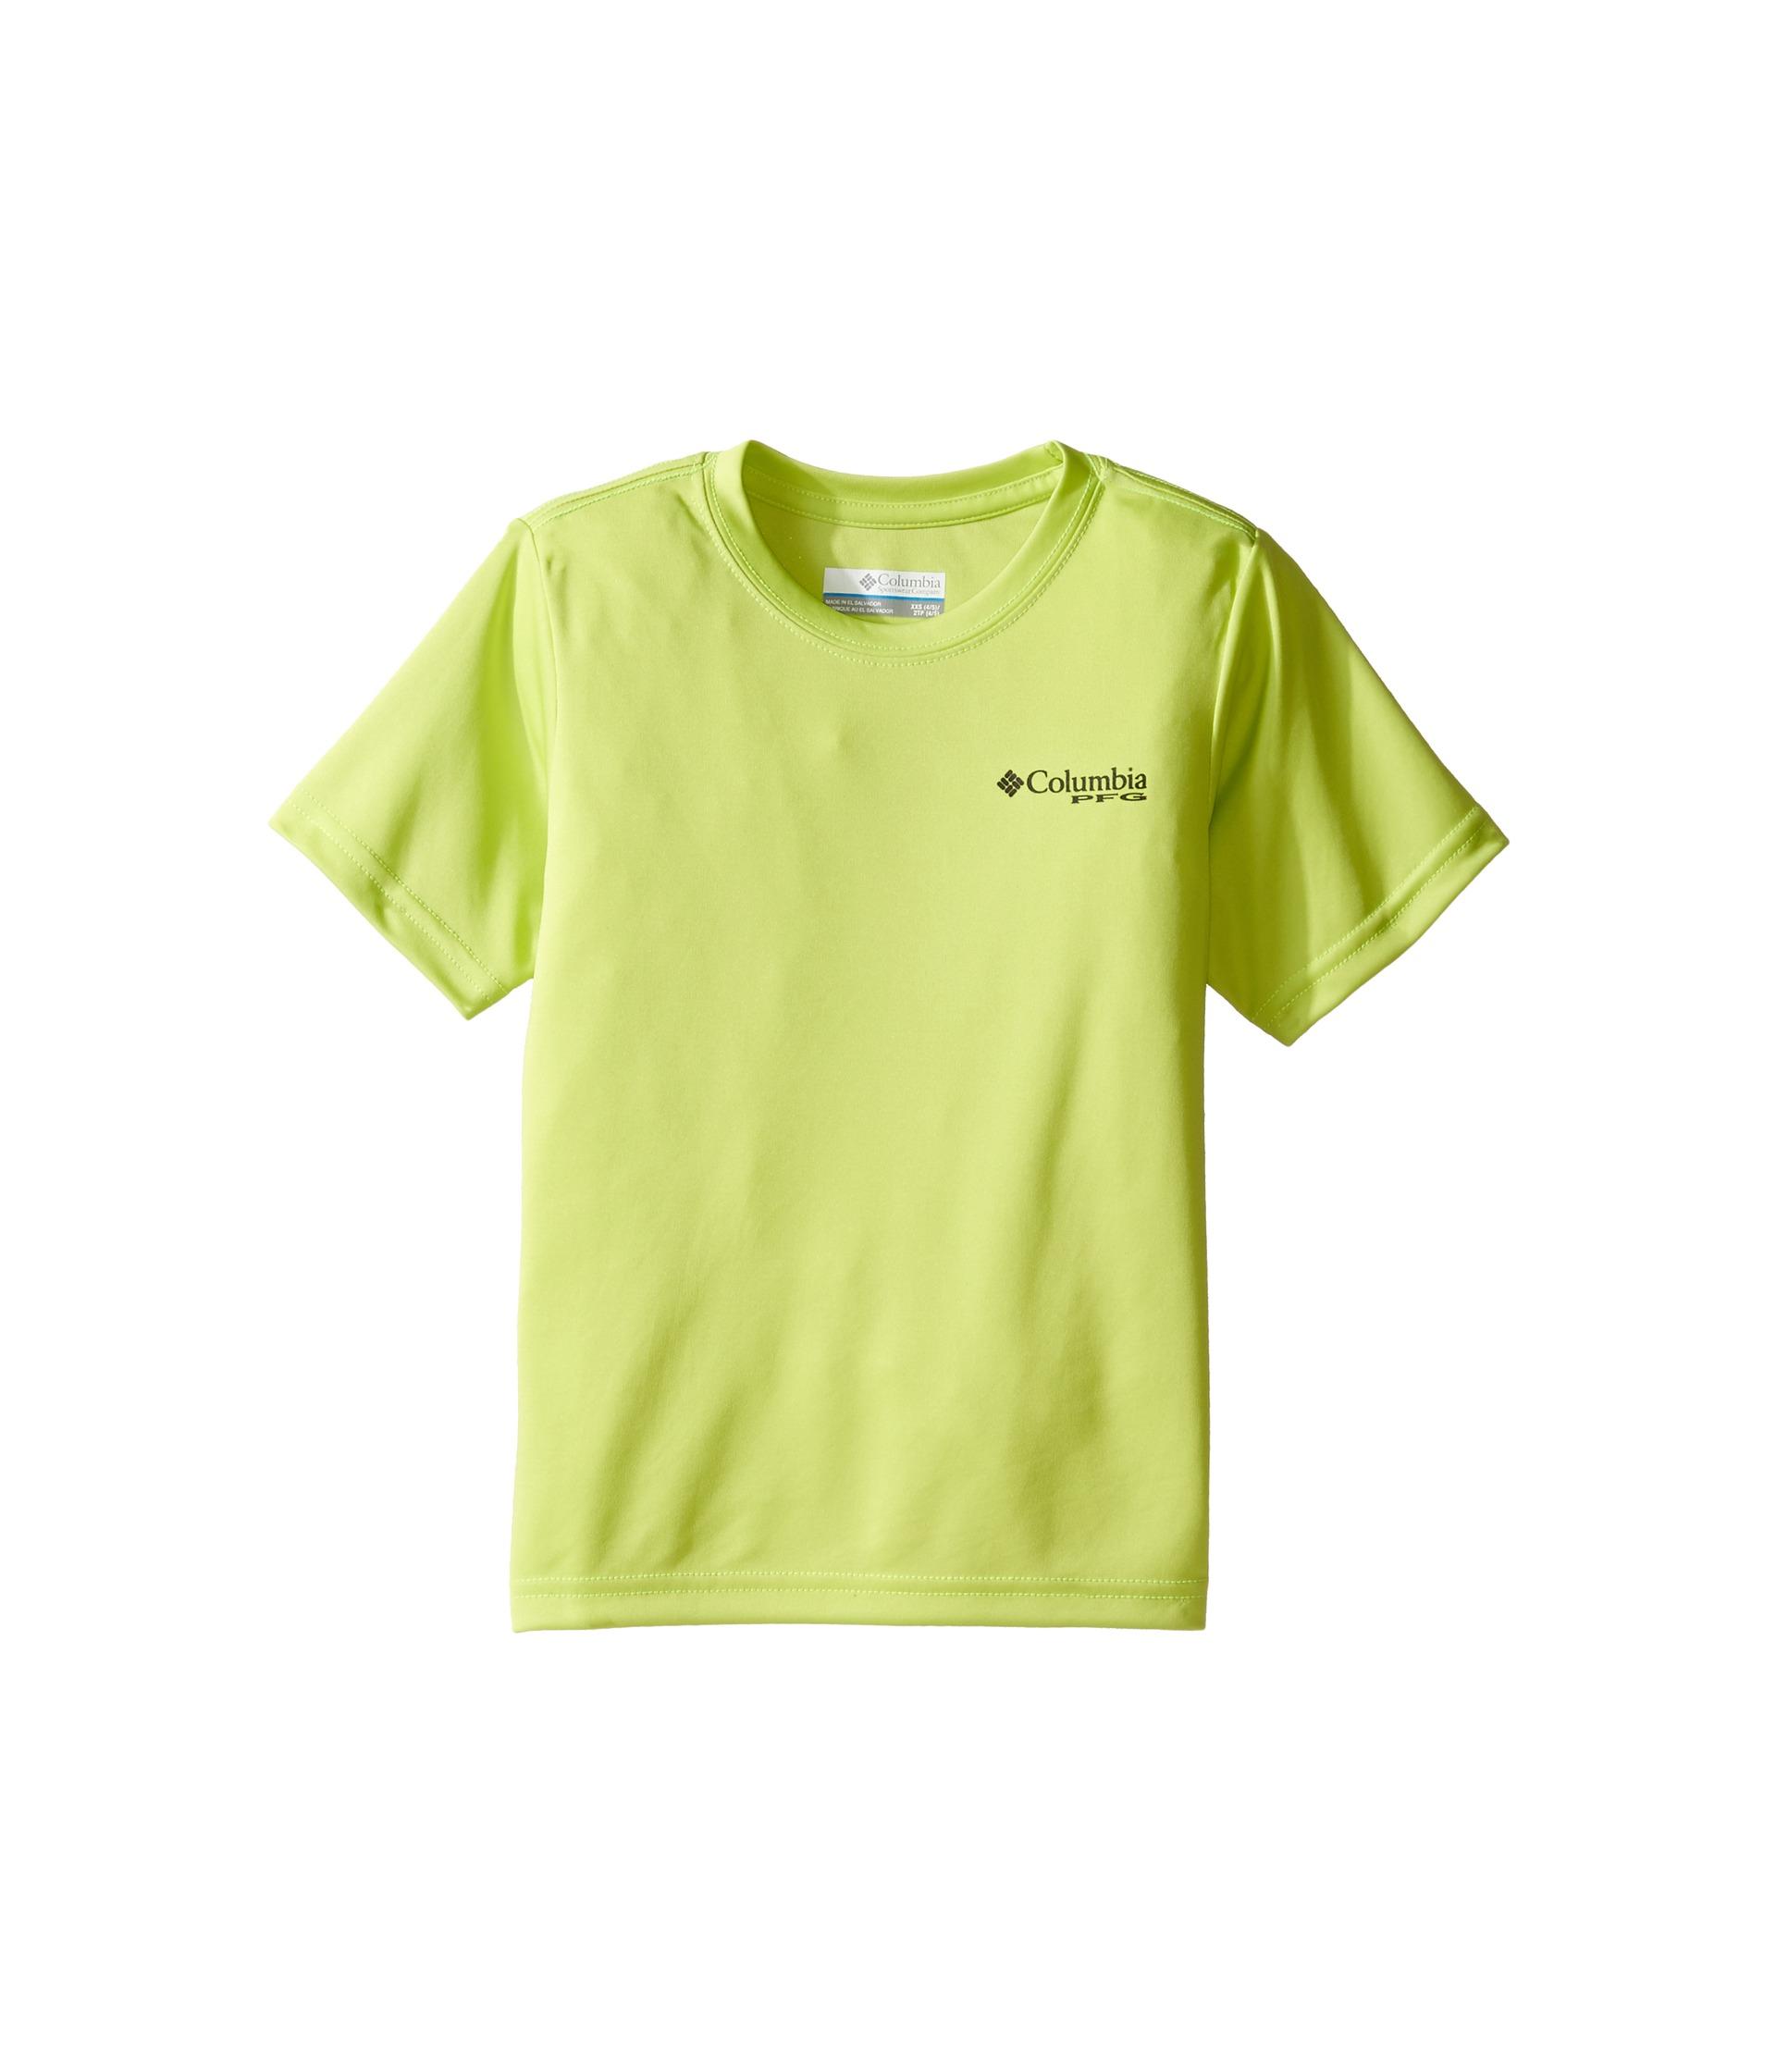 Columbia kids pfg triangle digicamo tee little kids big for Toddler columbia fishing shirt